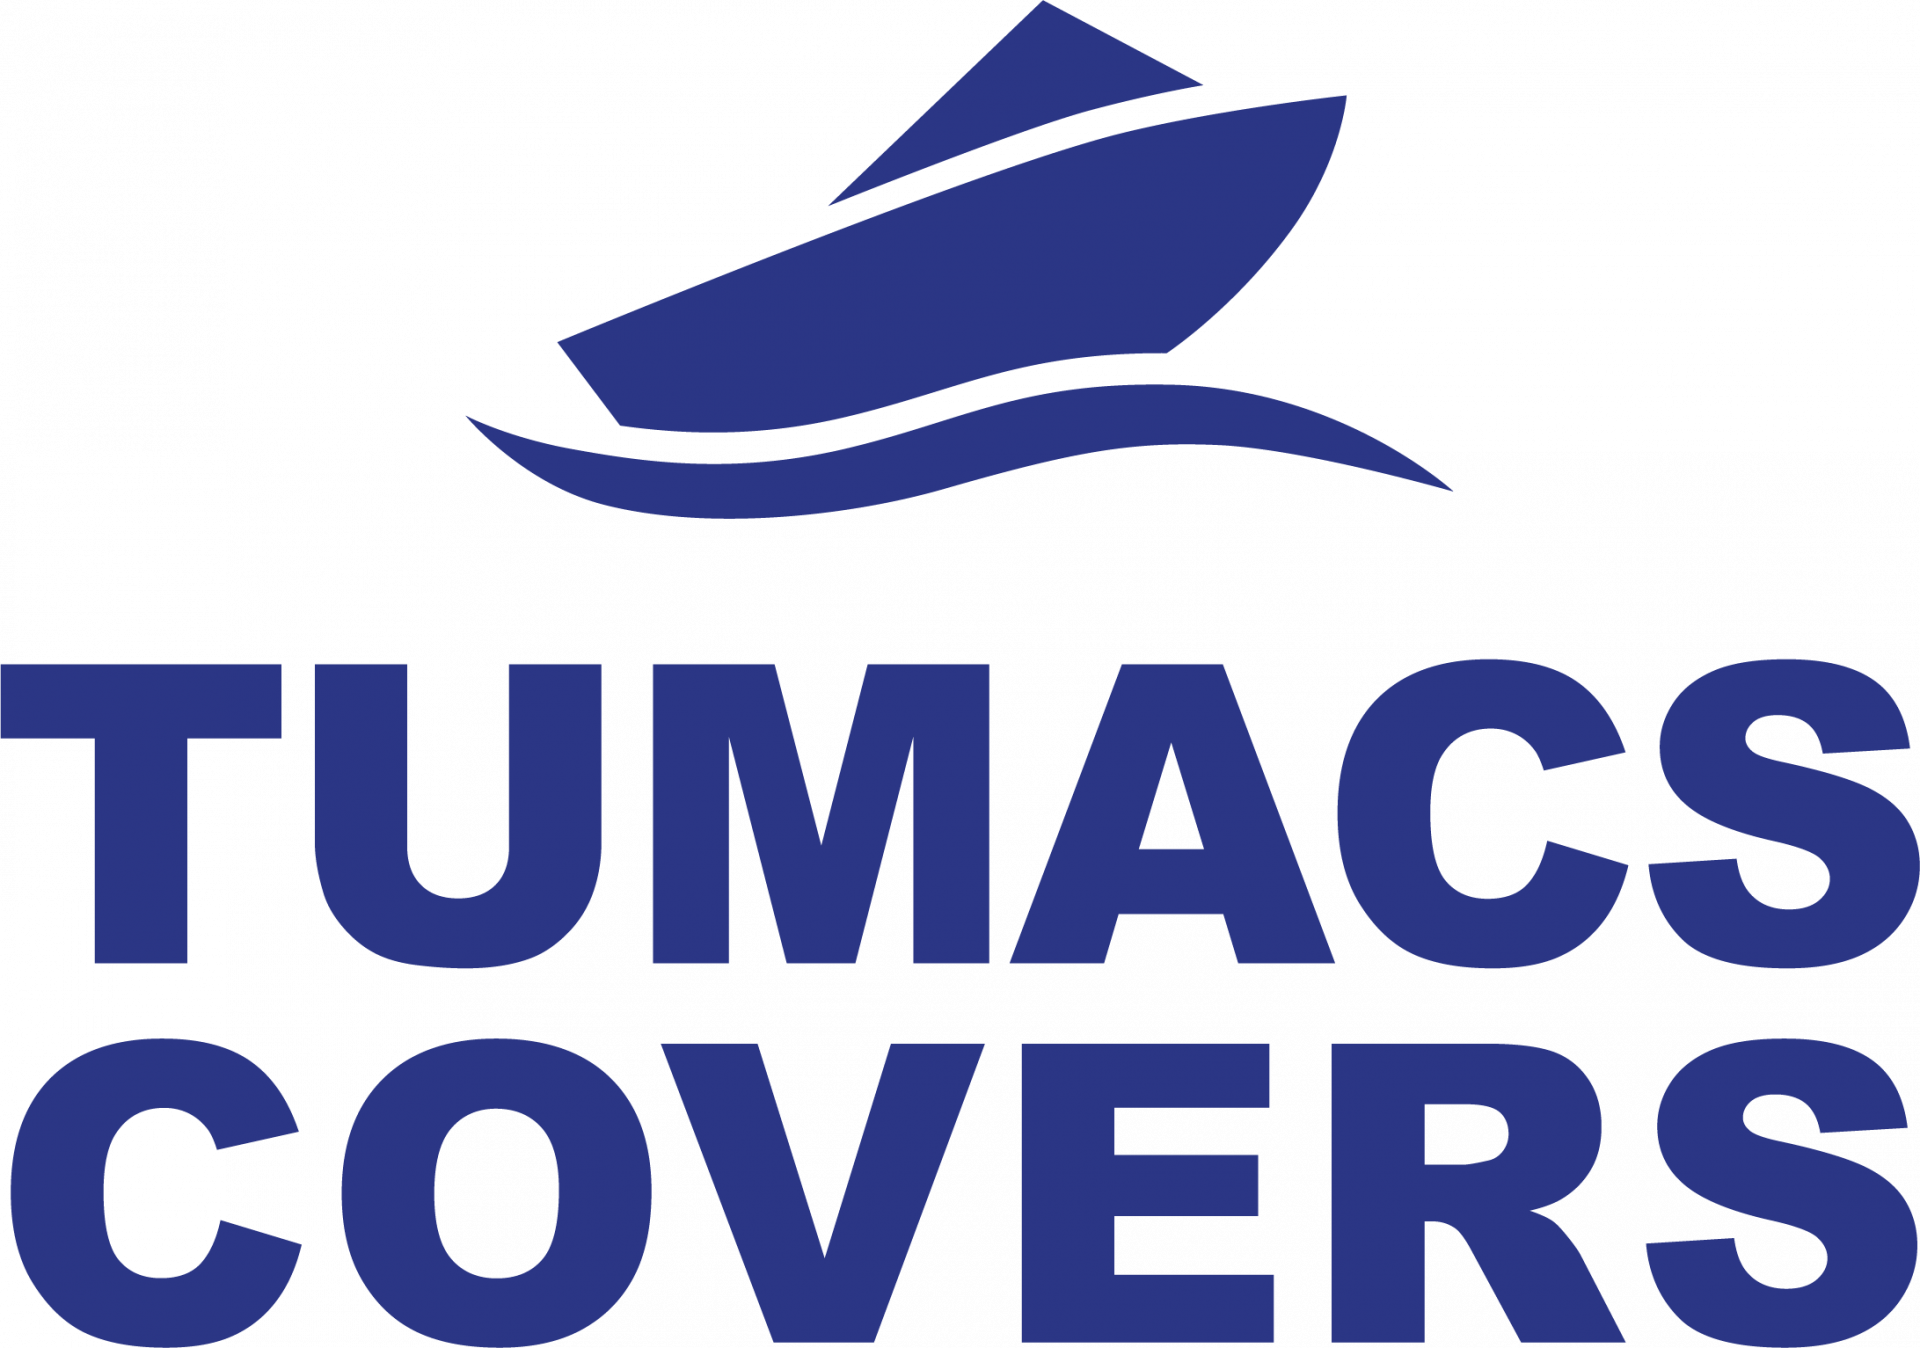 Tumacs Covers